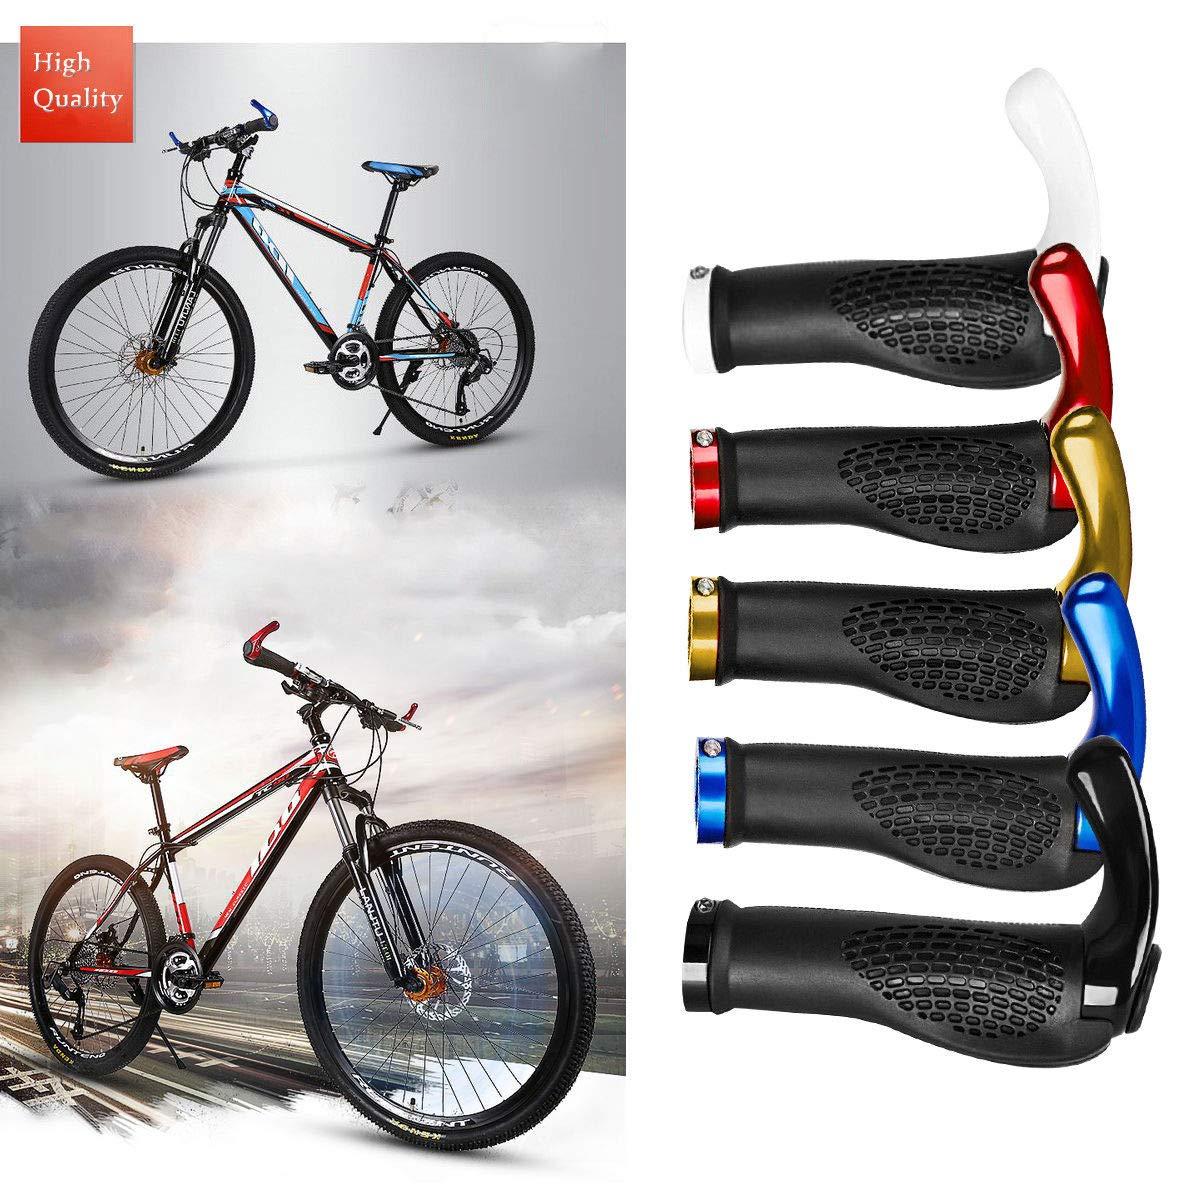 K9 Pair Black Rubber Mountain Bike Bicycle Cycling Lock On Handlebar Grips